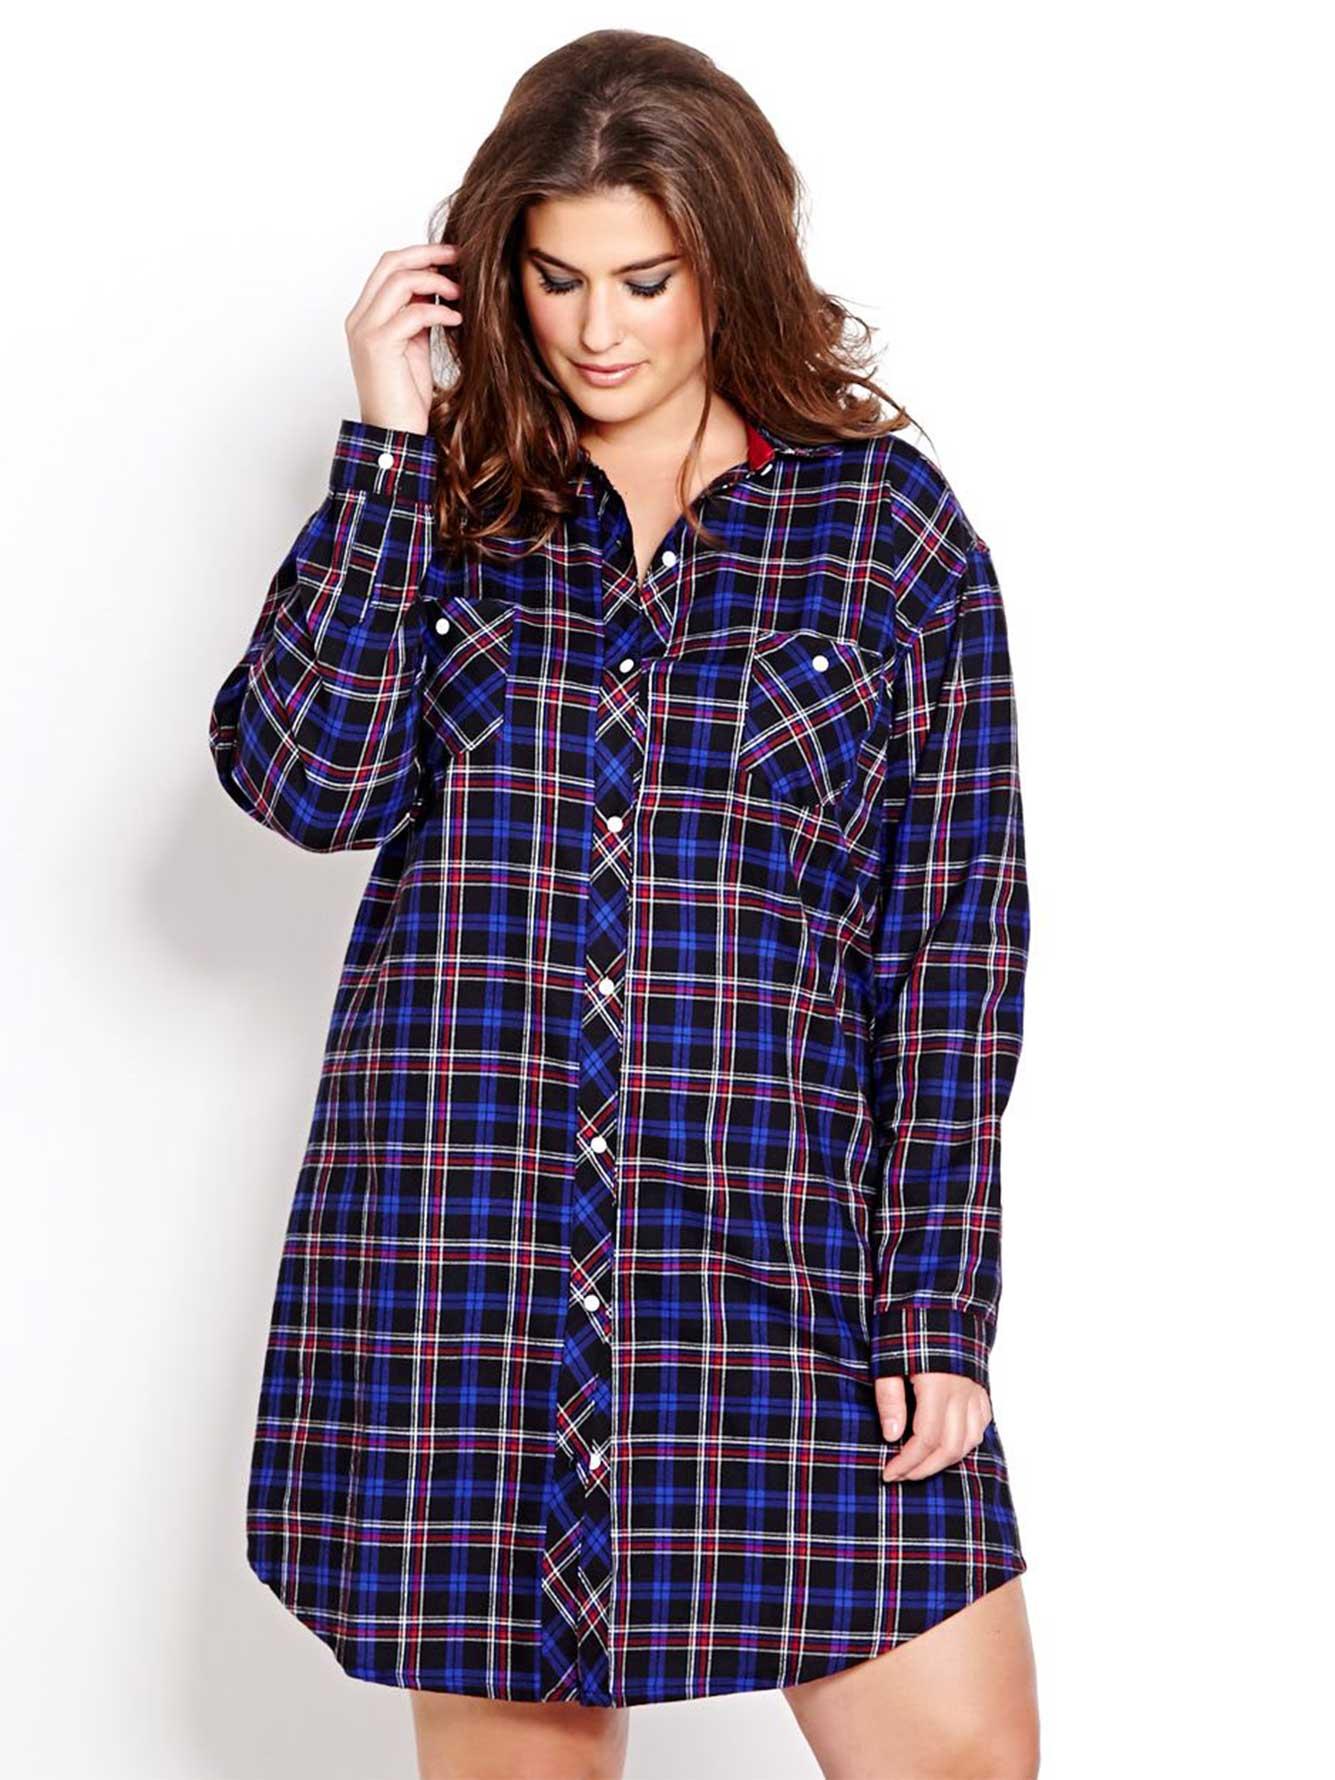 chemise de nuit en flanelle carreaux bonne nuit addition elle. Black Bedroom Furniture Sets. Home Design Ideas